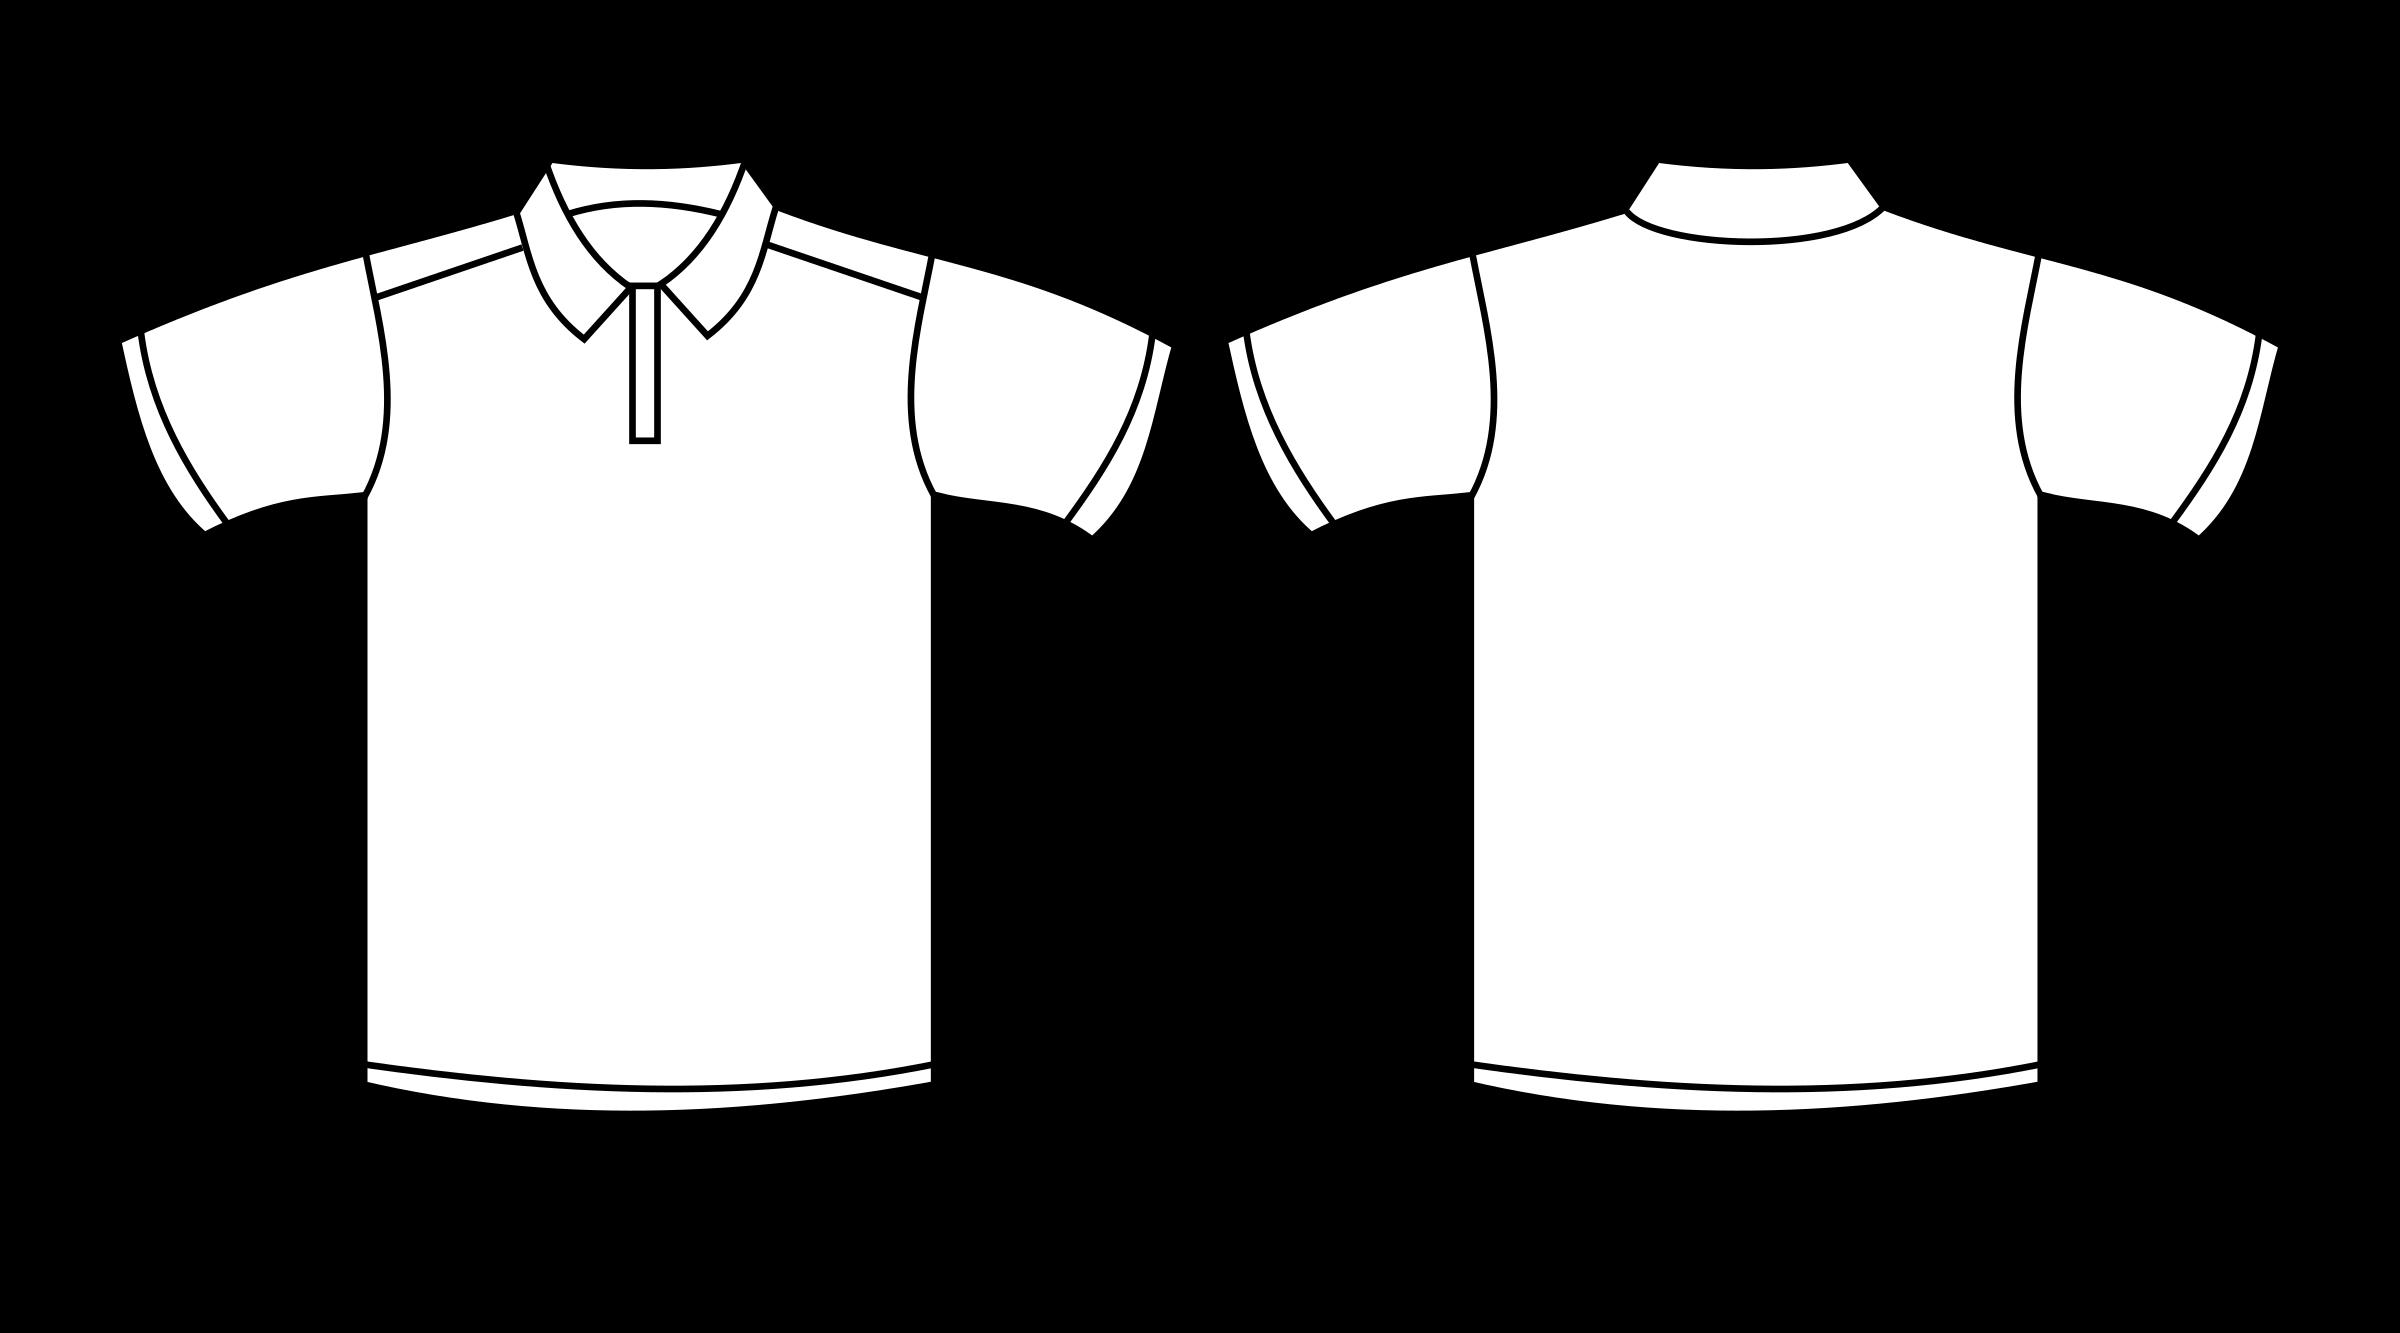 Design Kaos Polos - ClipArt Best